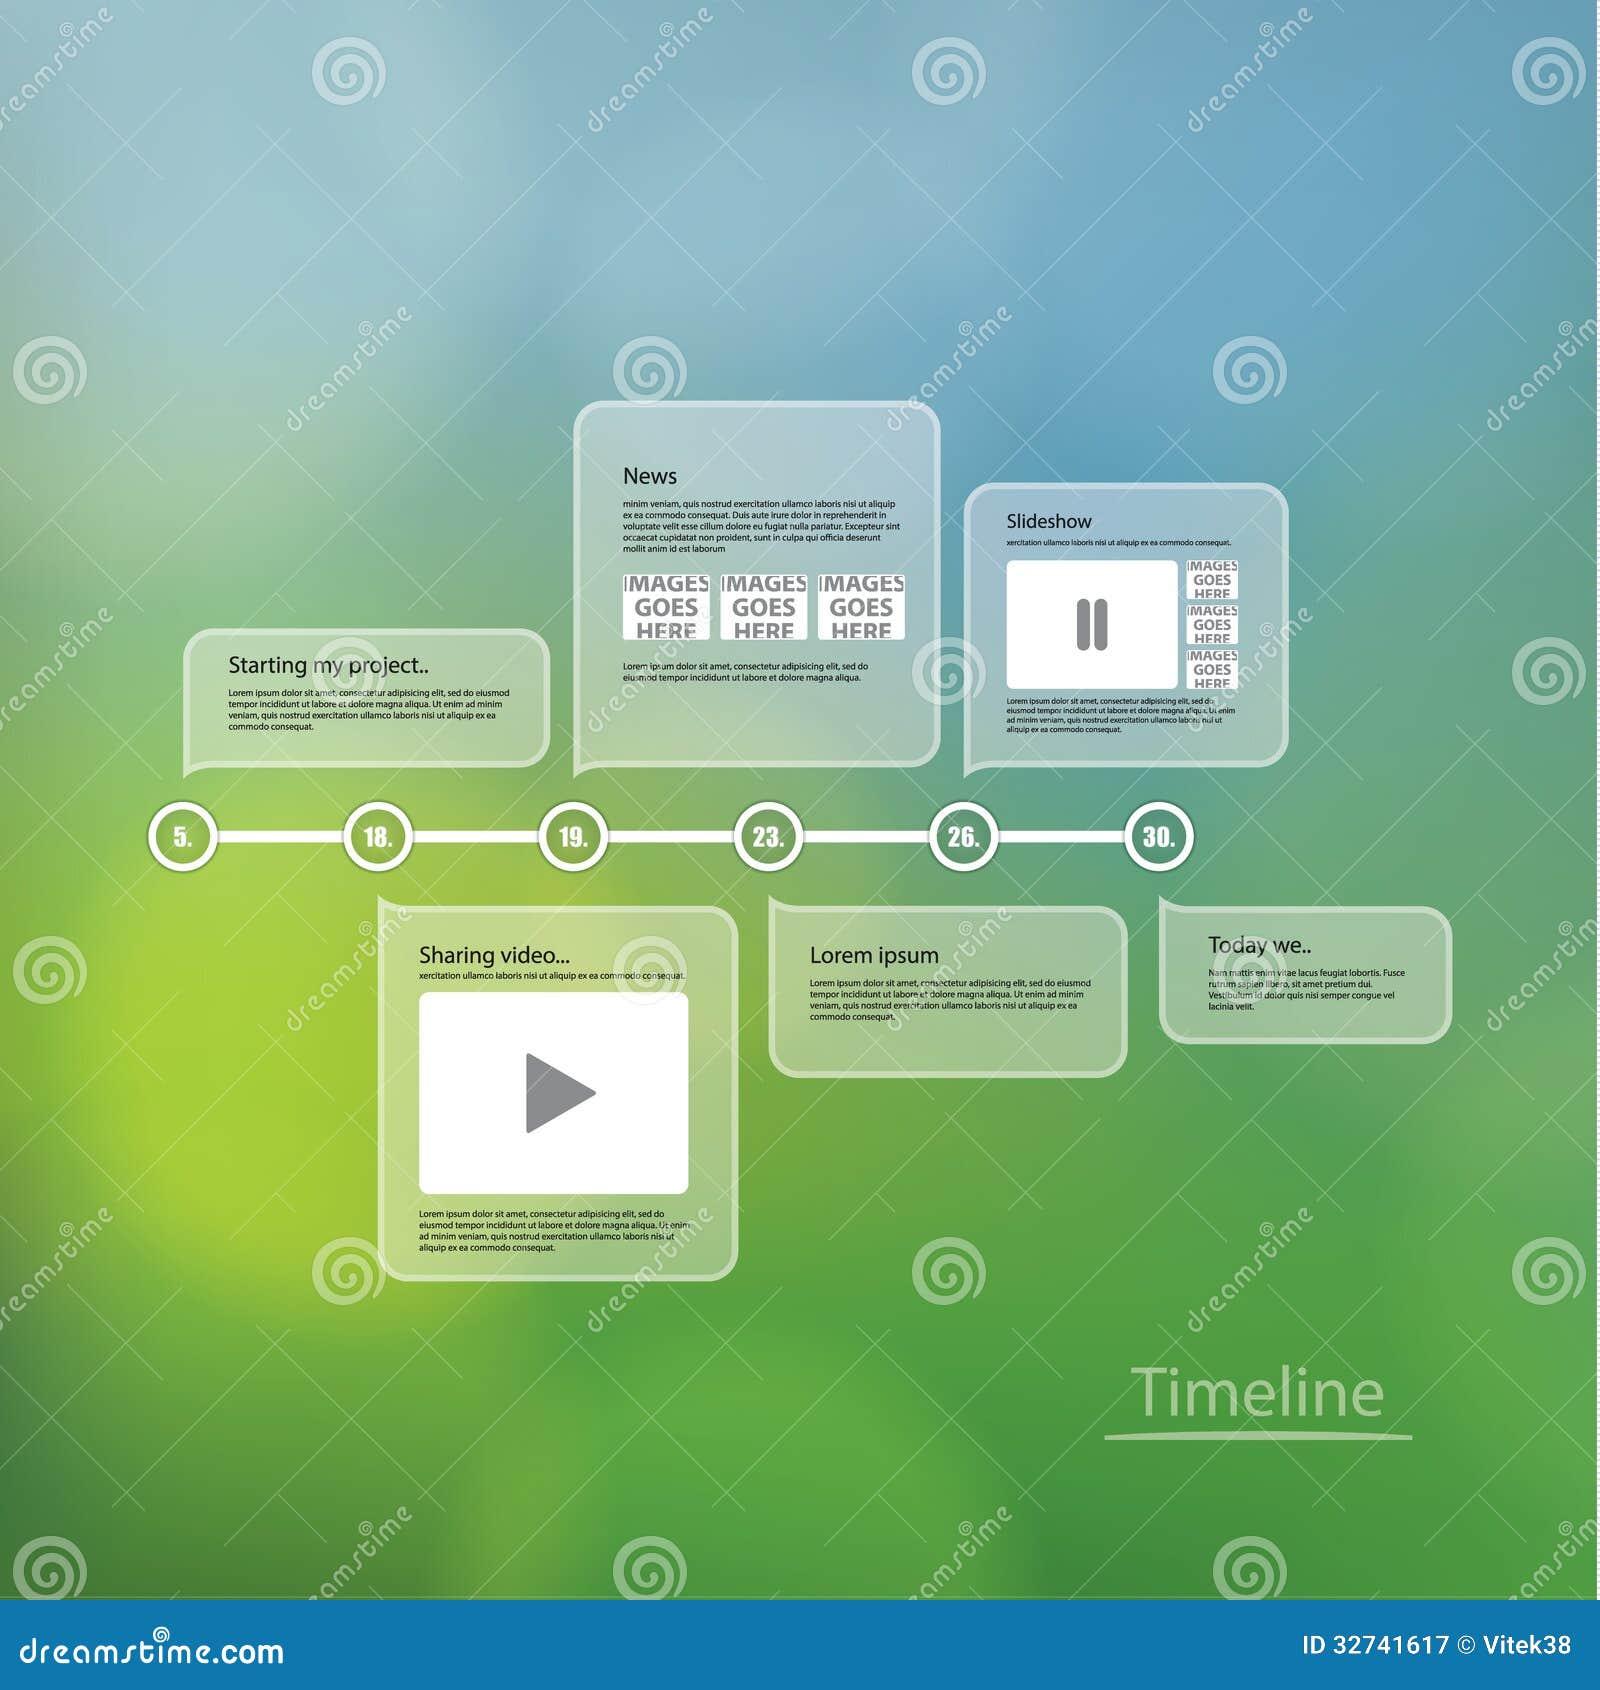 Timeline Template Vector timeline template.